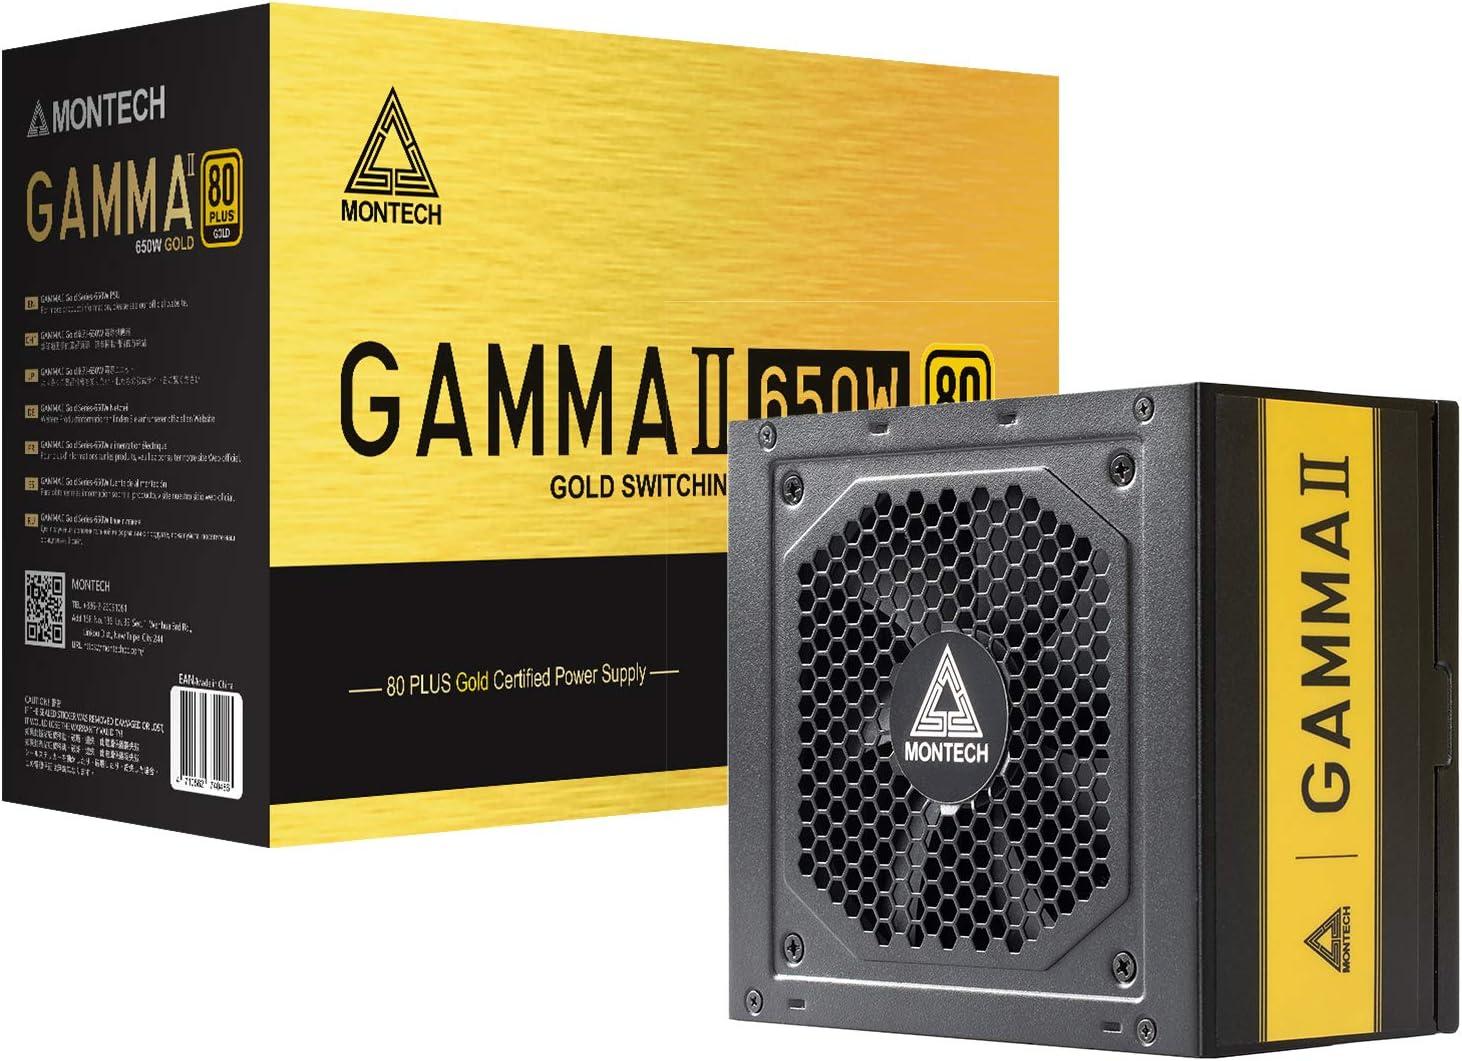 Montech Gamma II Series 650 Watt 80+ El Paso Mall Supply Certified Gold Quantity limited Power